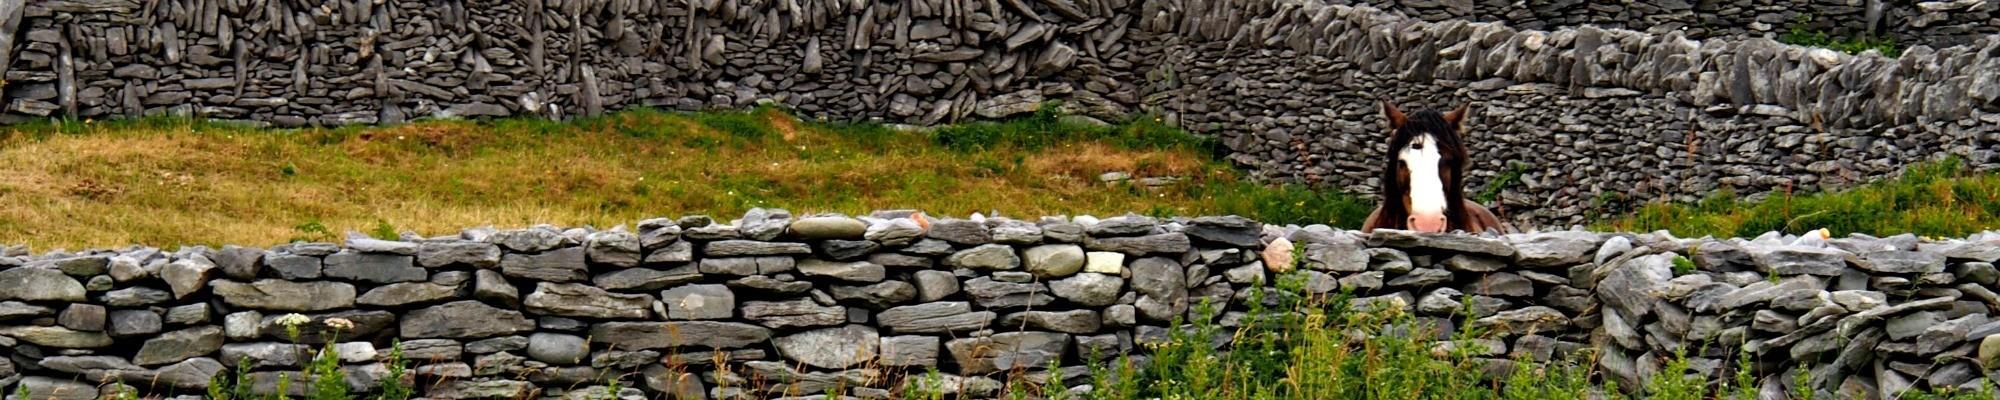 Horse on Inis Oirr, Aran Islands, Ireland. © 2016 Jody Halsted, Ireland Family Vacations; Halsted Enterprises, Inc.